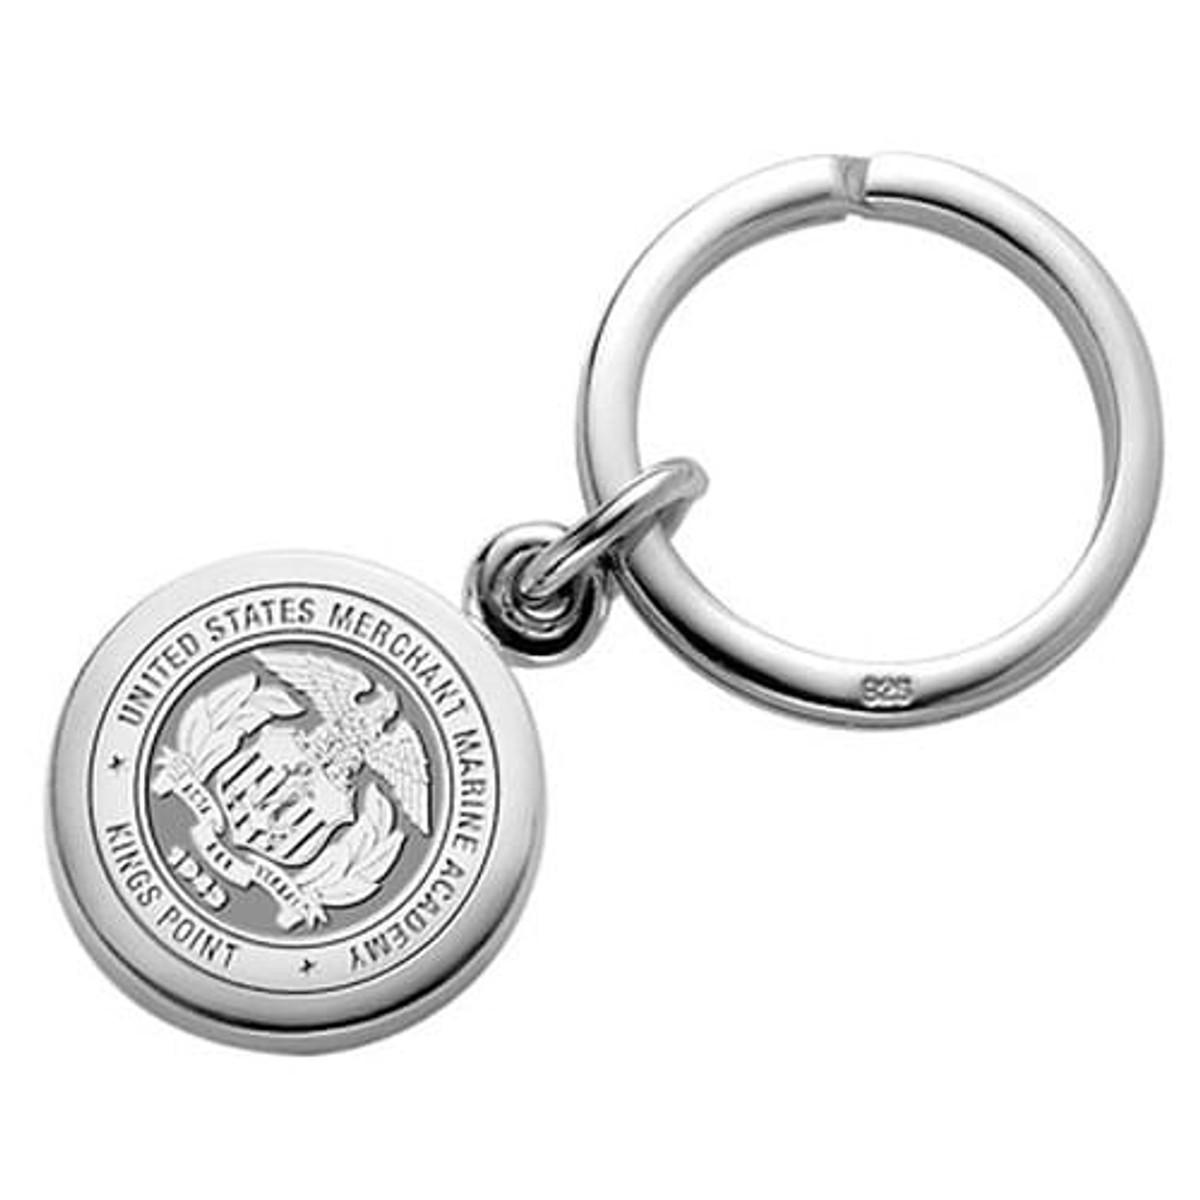 us merchant marine academy sterling silver insignia key ring Jefferson Nickel Values